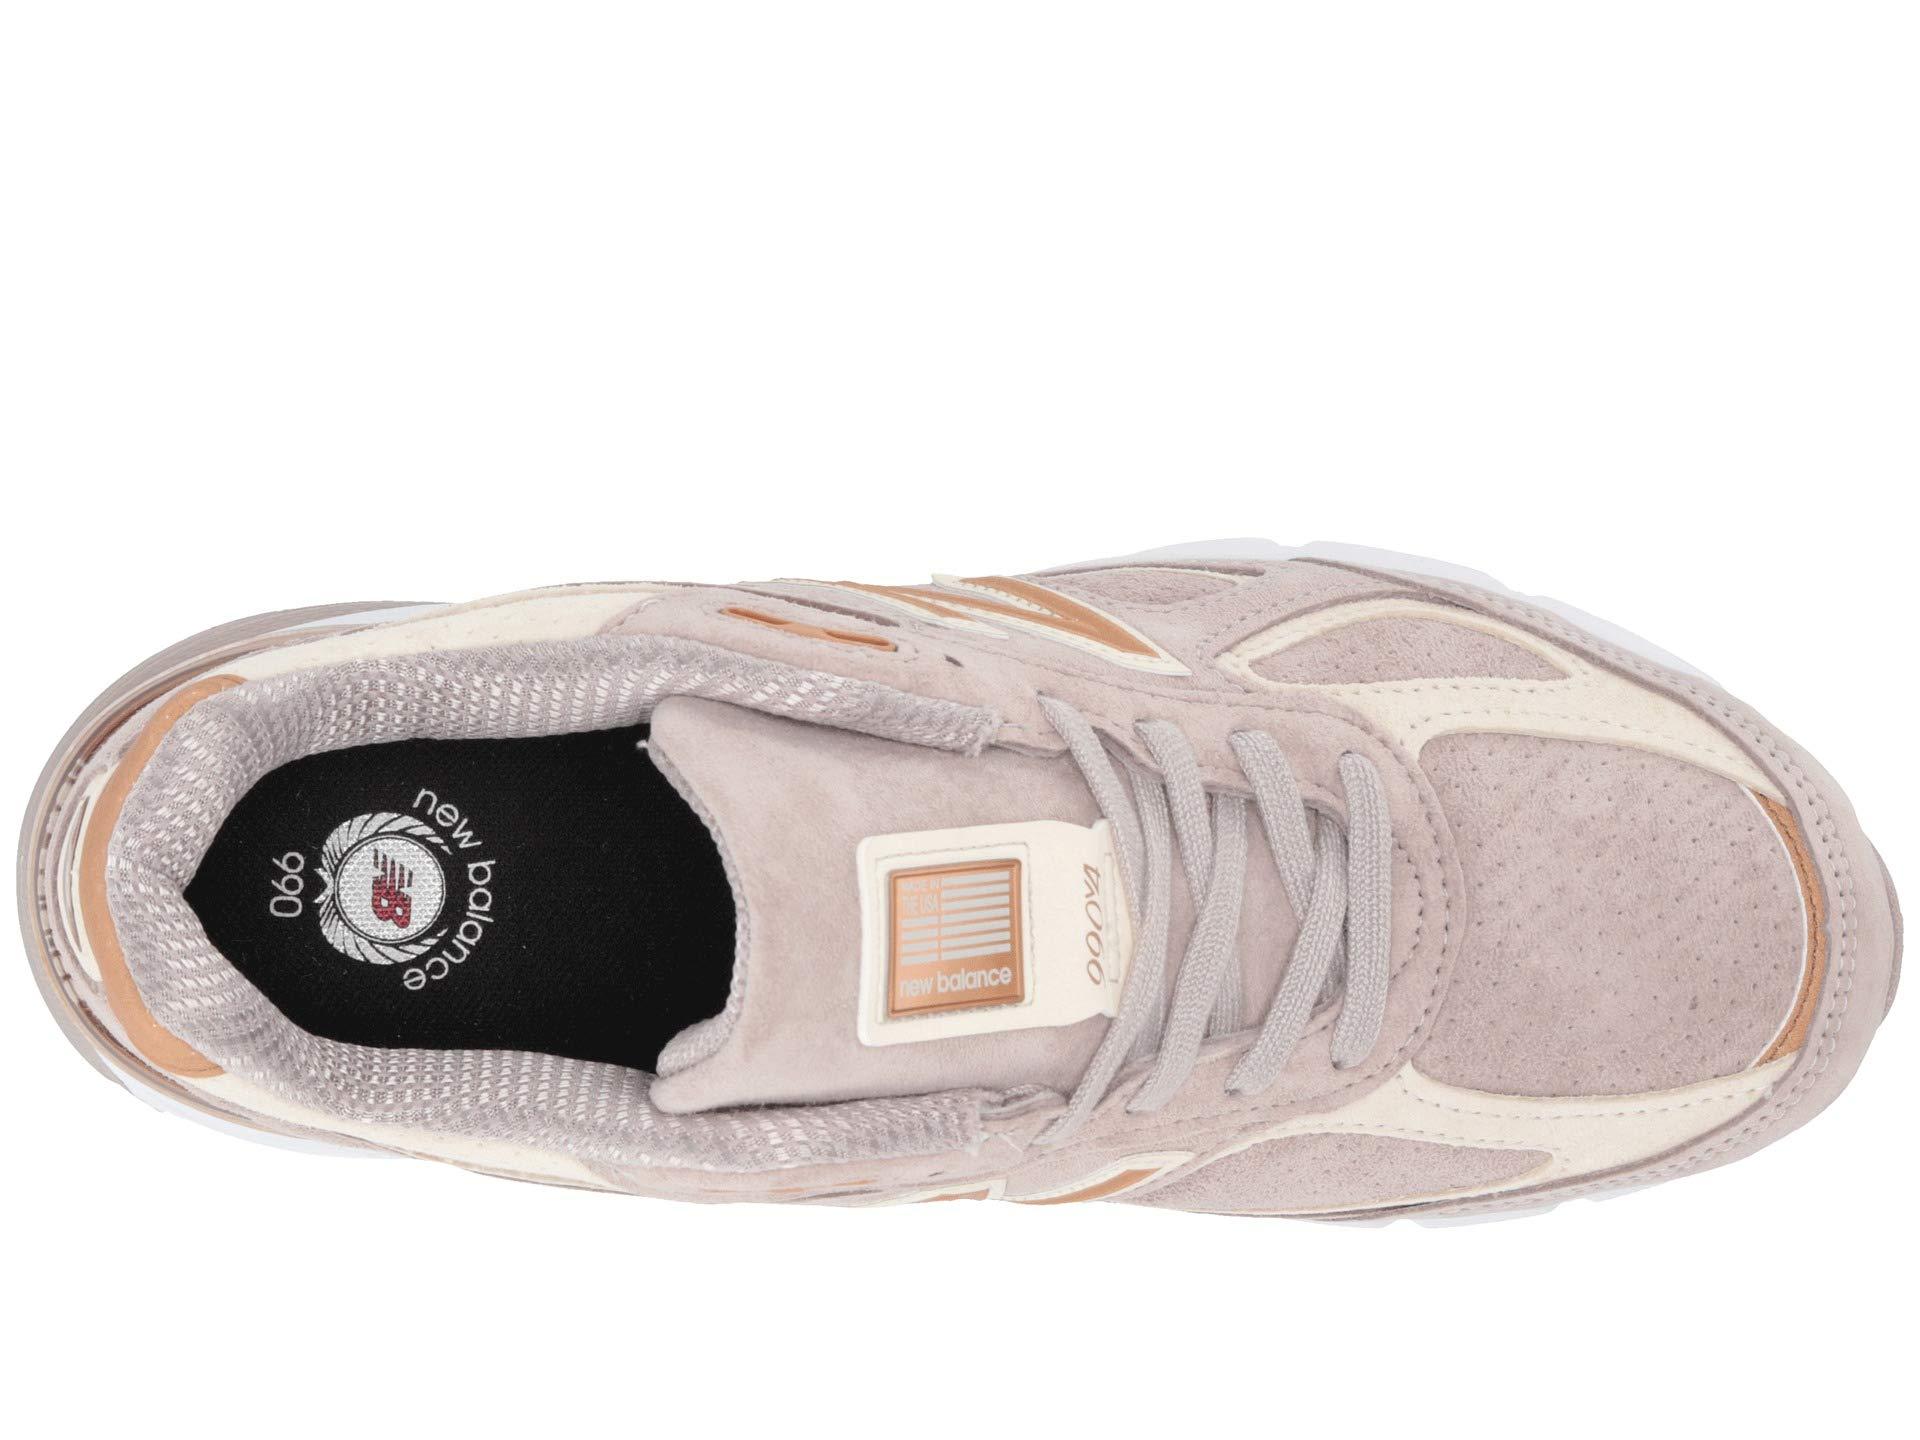 Flat White W990v4 Balance New alabaster qzpU0w